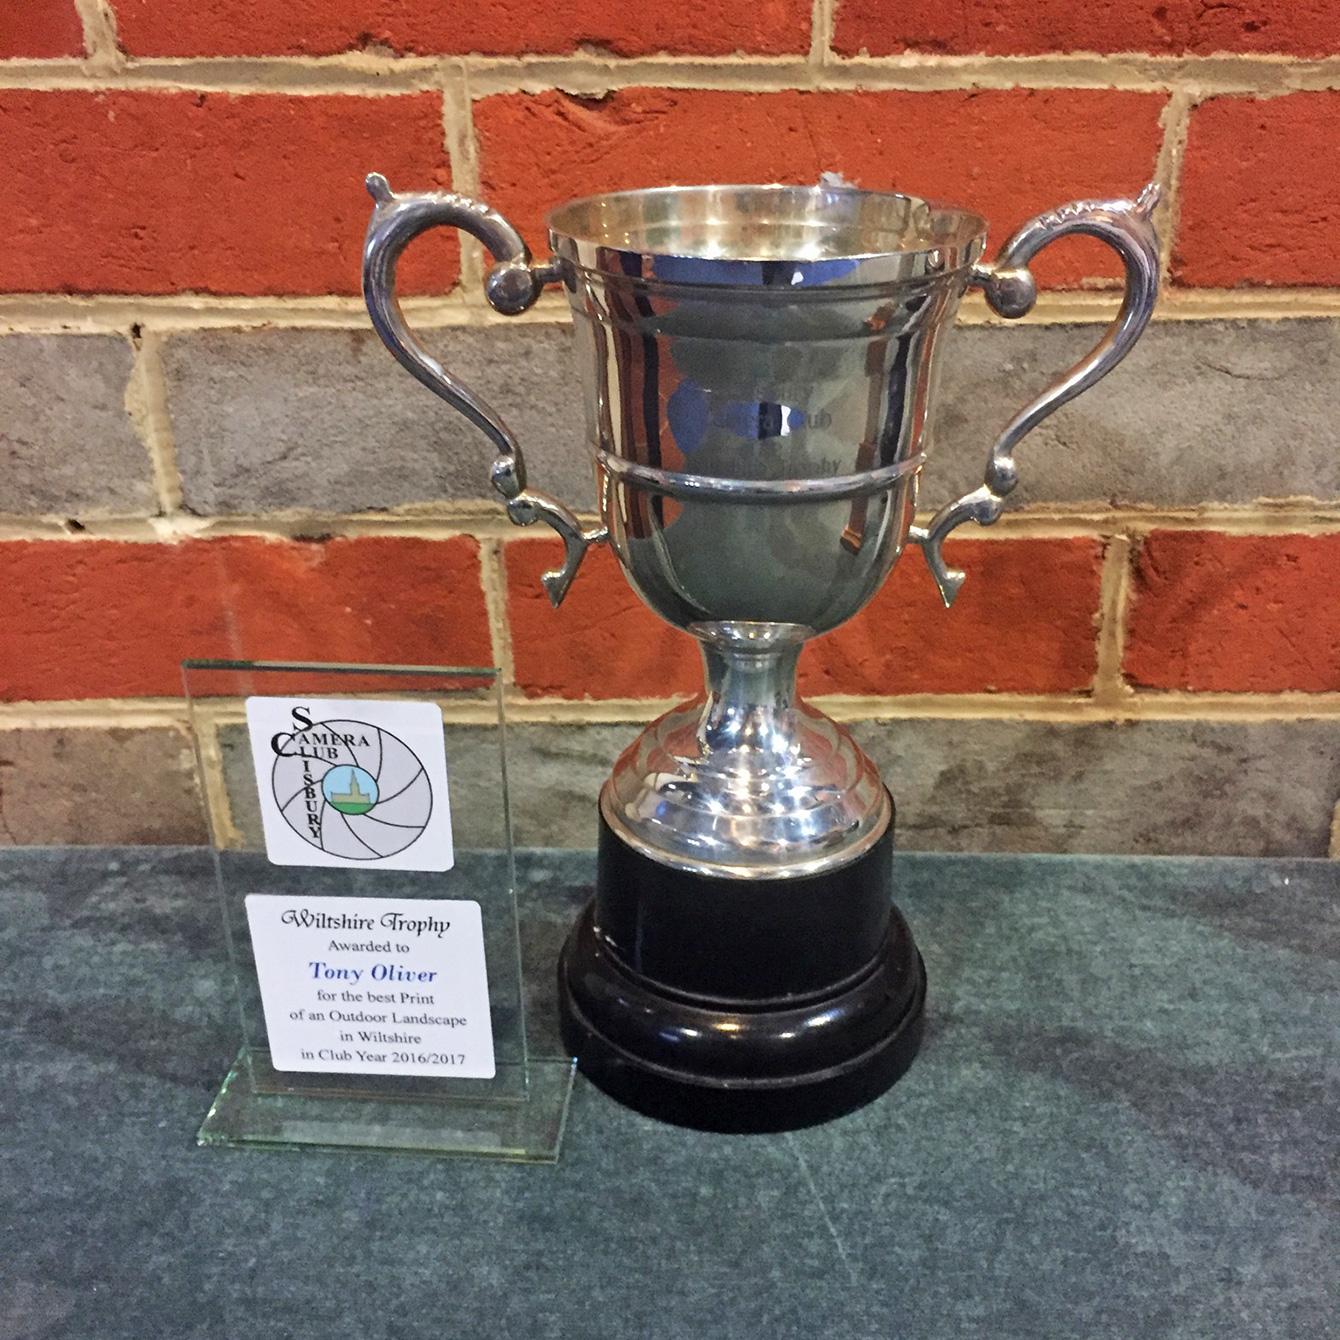 Wiltshire Trophy Winner Tony Oliver